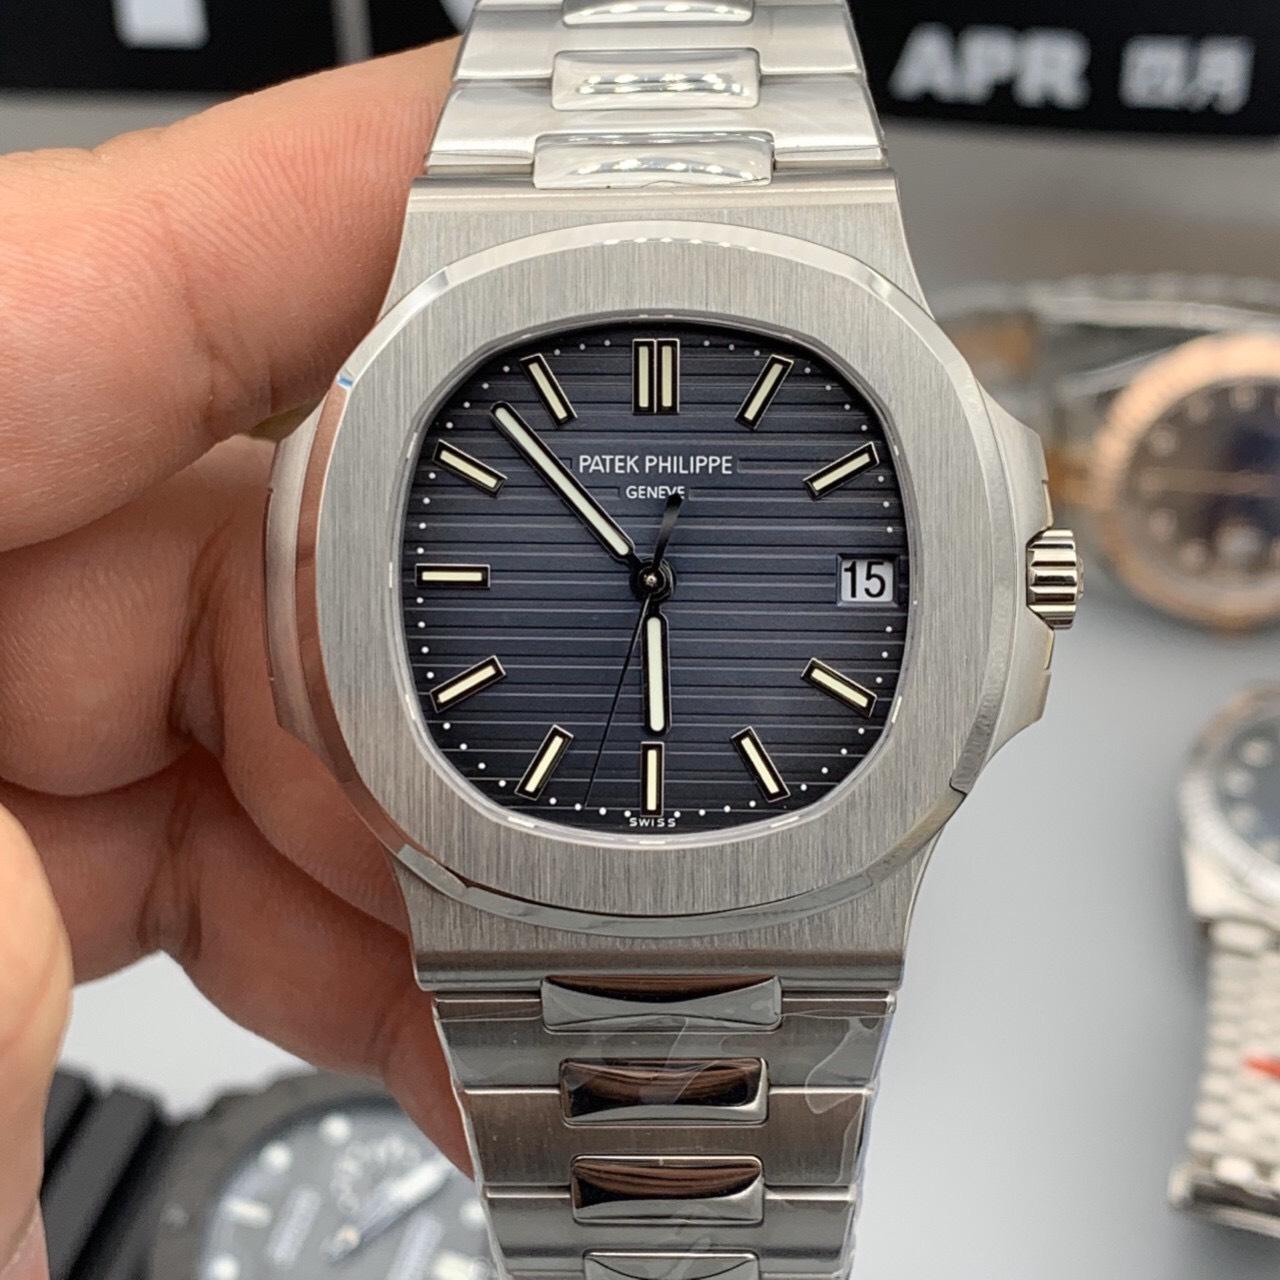 đồng hồ patek philippe fake